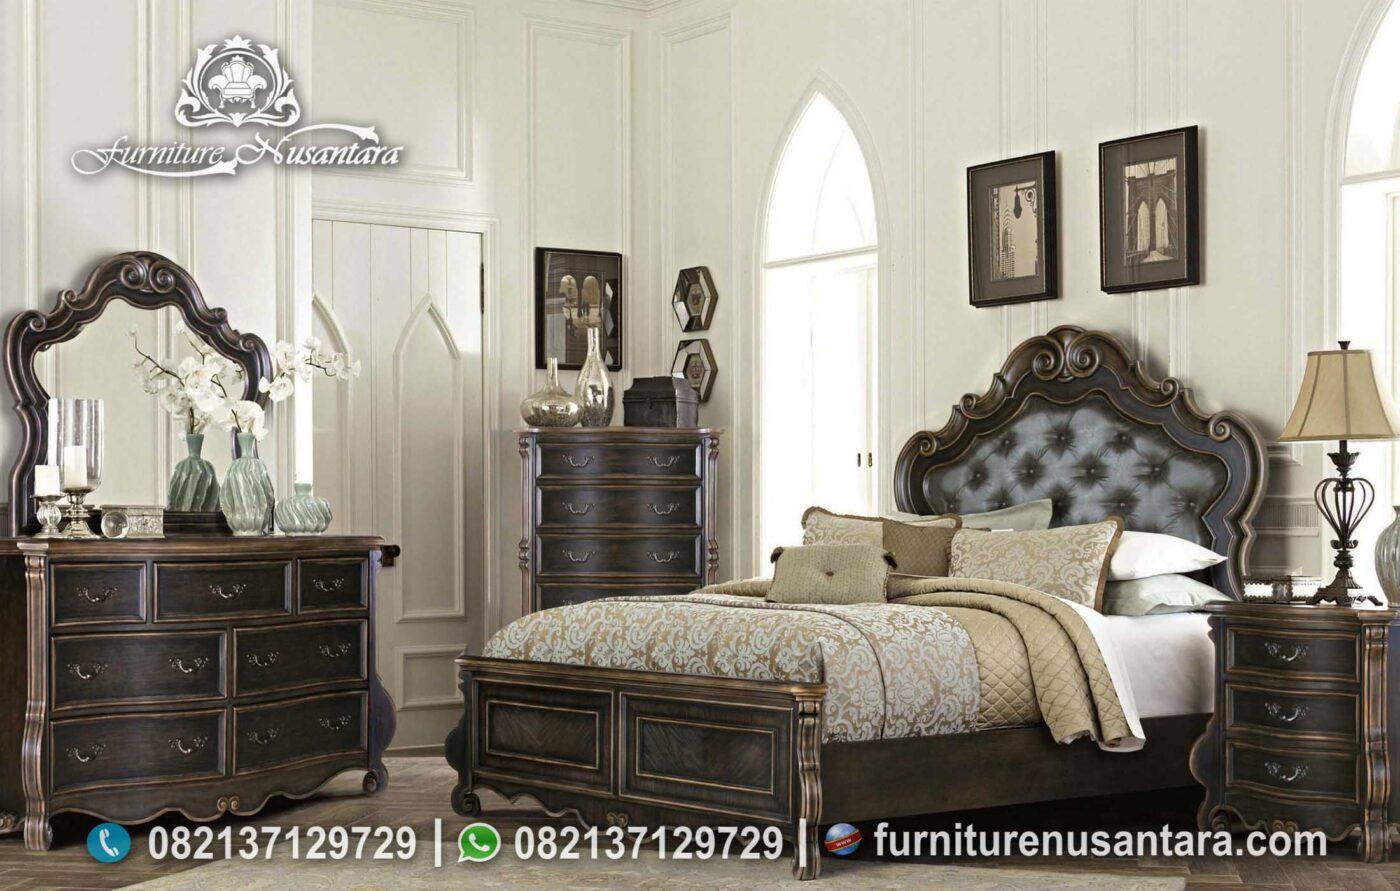 Kamar Tidur Murah Model Victorian Hitam KS-164, Furniture Nusantara